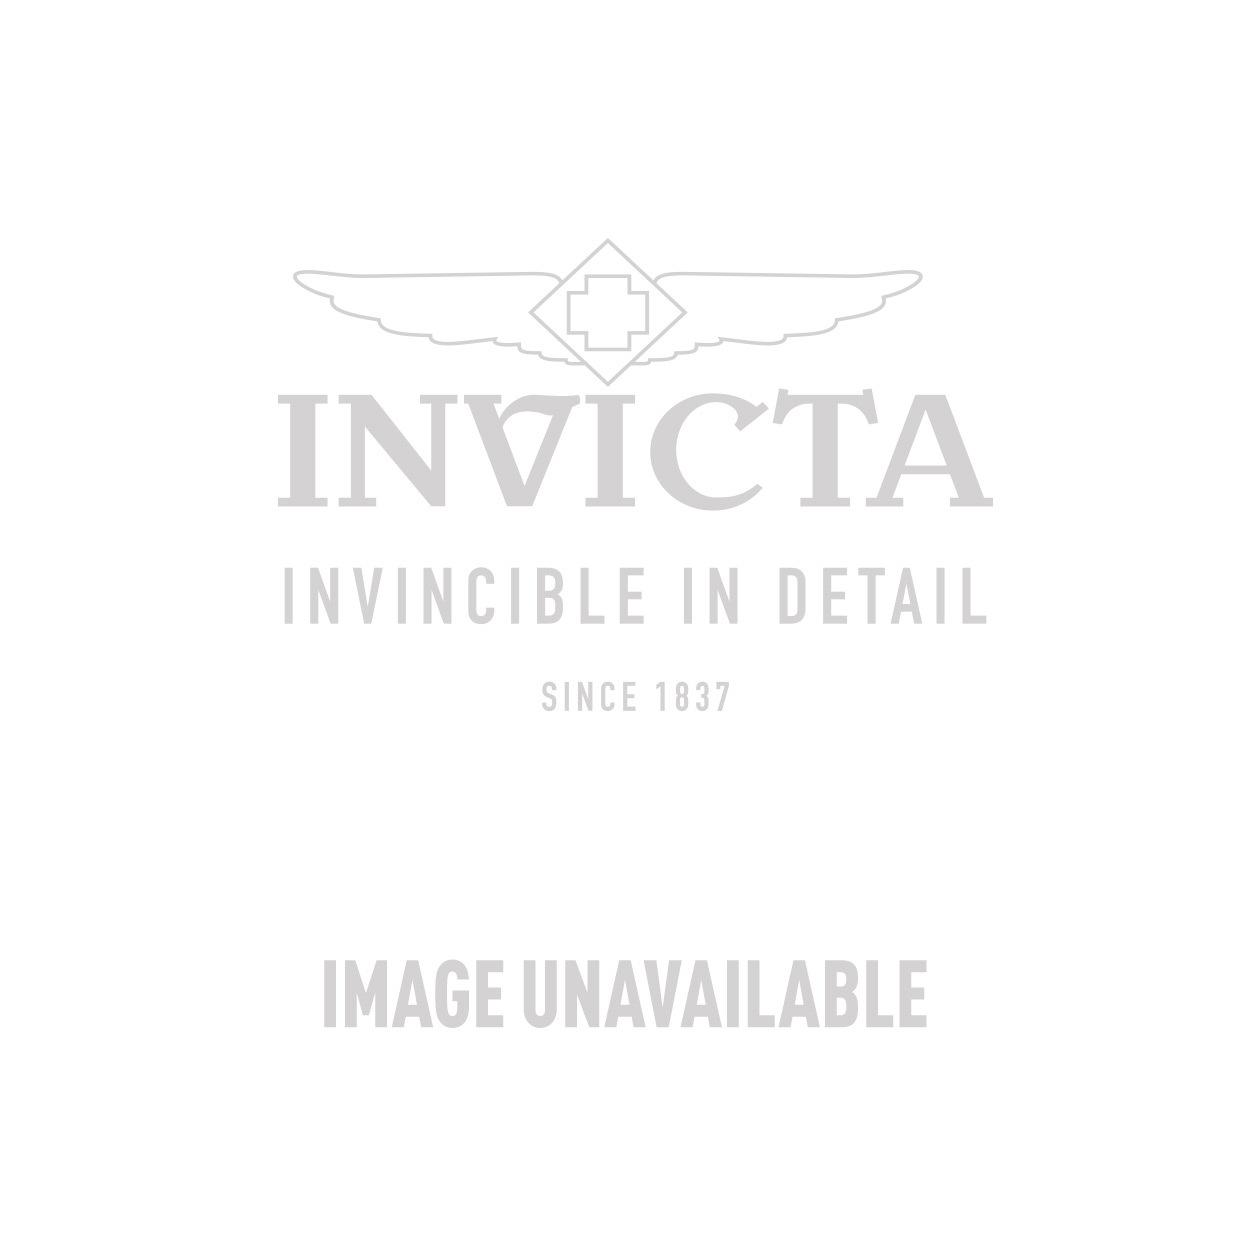 03670db3f Invicta Russian Diver Men Quartz 52mm Stainless Steel, Silver Case Silver  Dial - Model 25730